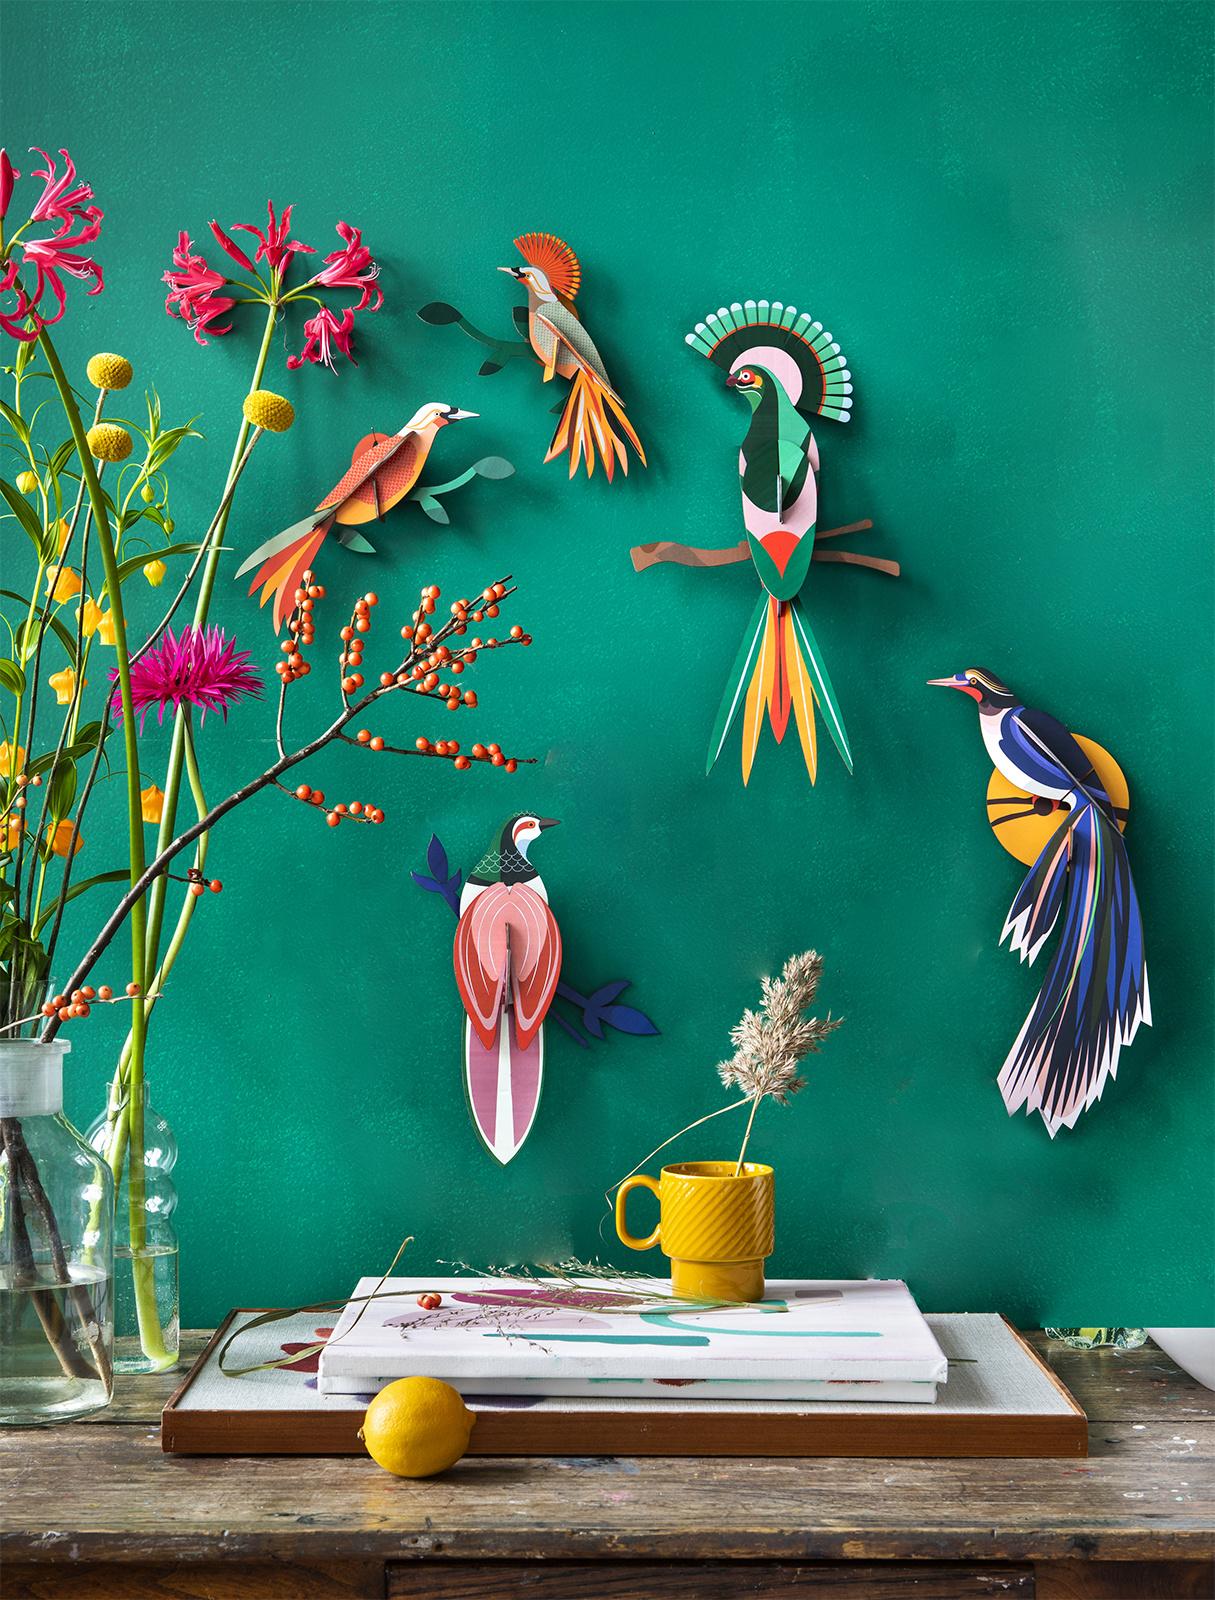 Studio Roof 3D Wanddecoratie Paradise Bird Rani